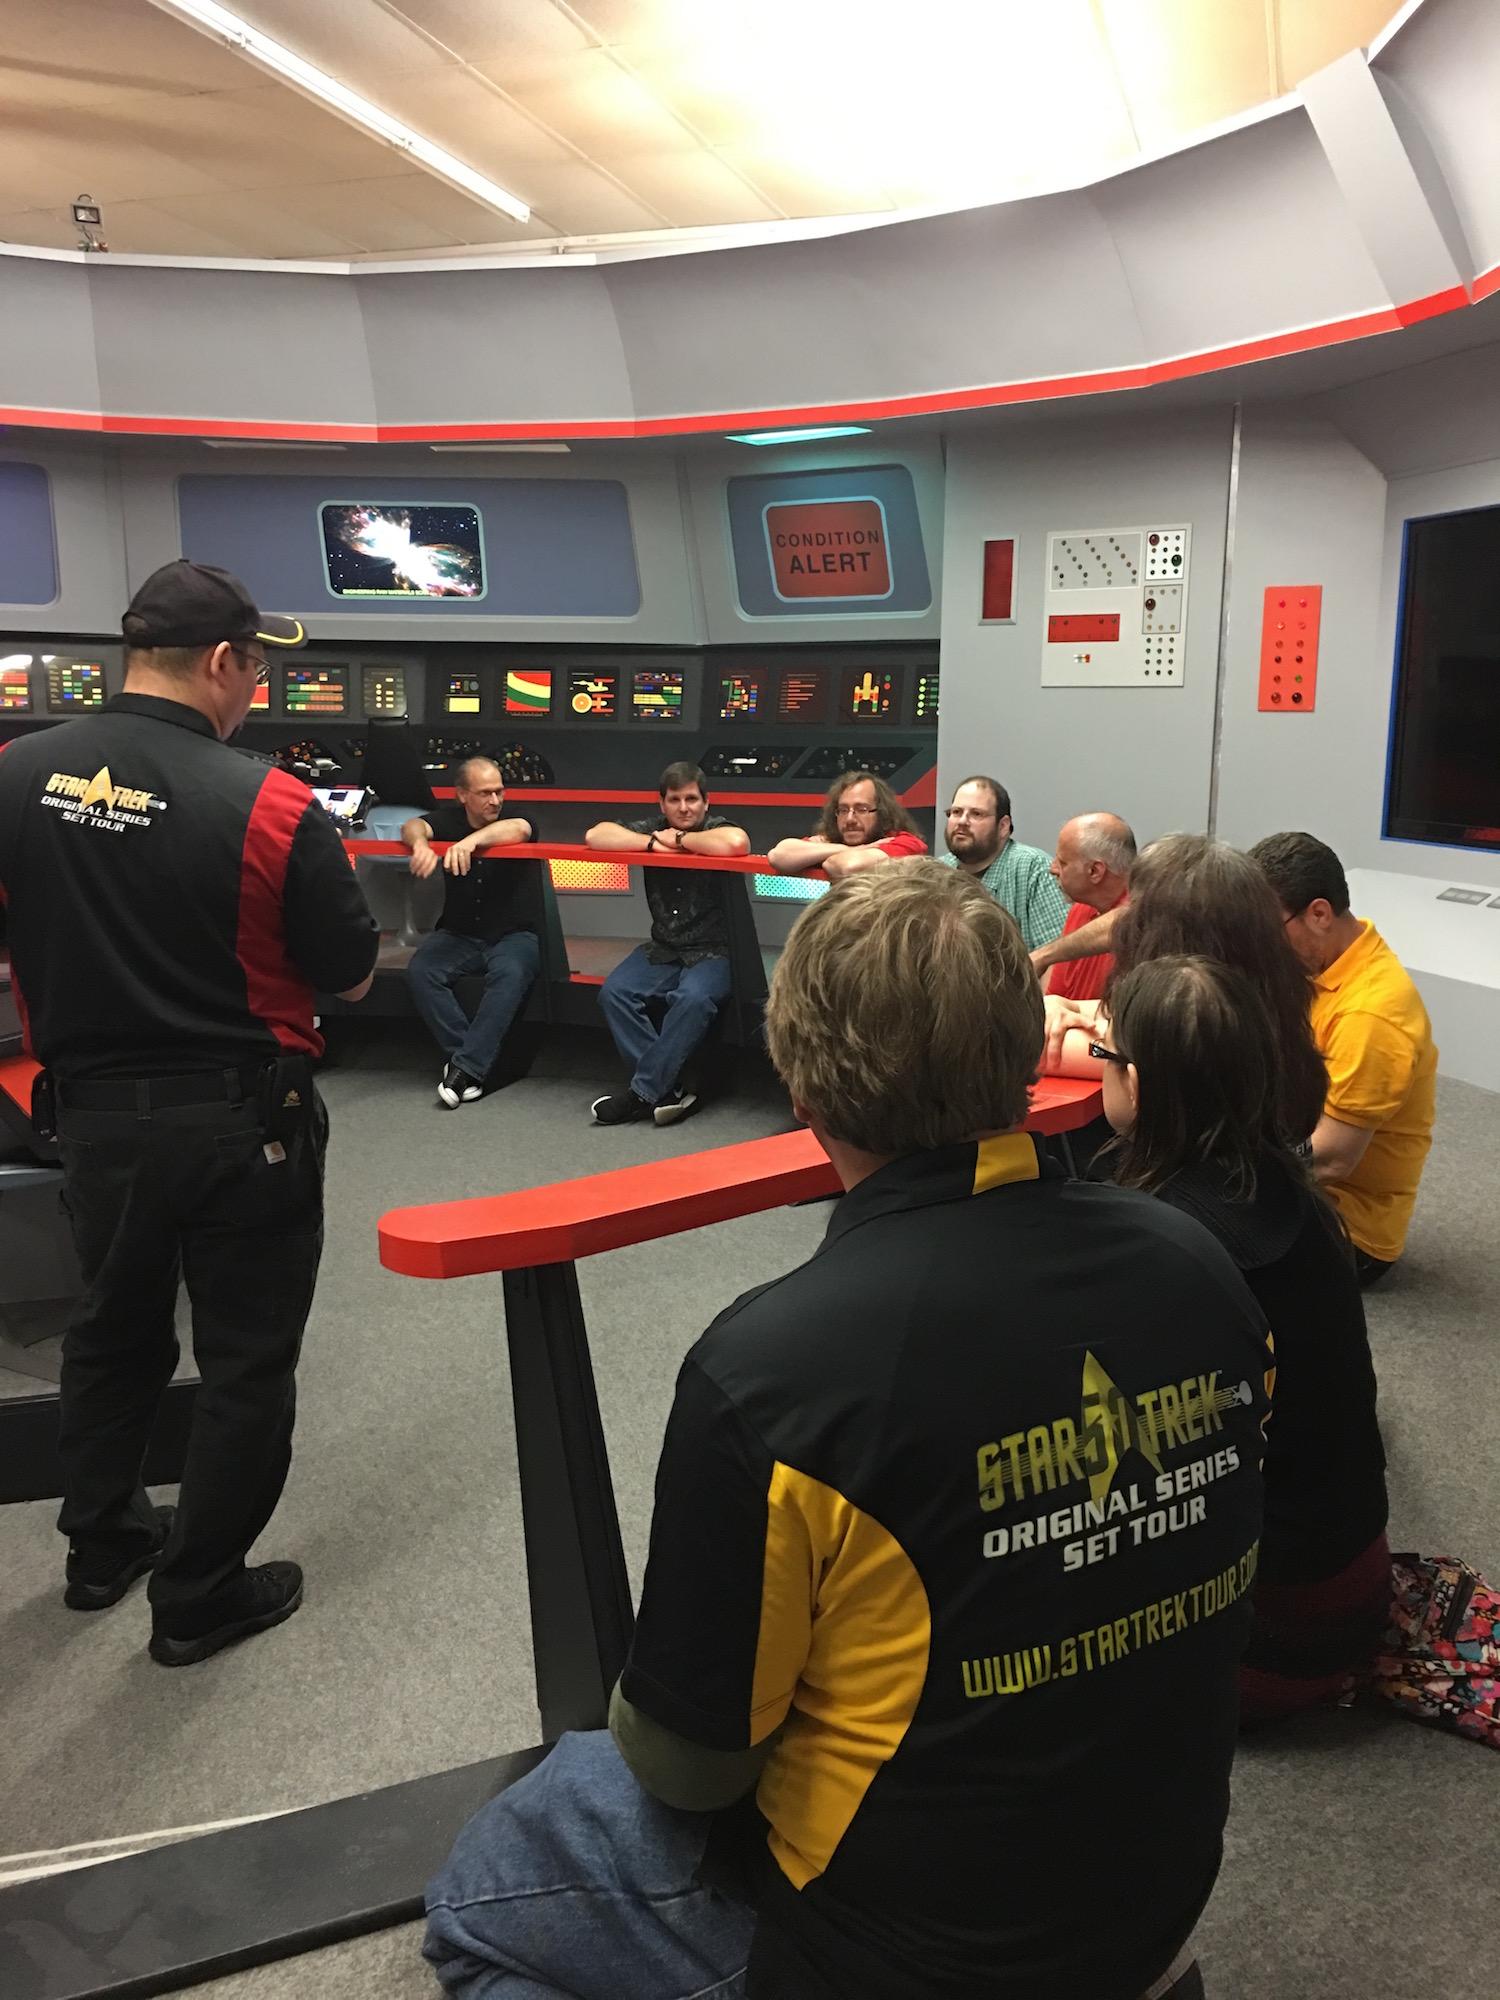 Group Interview with the  Star Trek  Writers; Clockwise, on the Bridge Railing: Scott Pearson, Dayton Ward, Keith R. A. DeCandido, Dave Galanter, Michael Jan Friedman, and Bob Greenberger ©2017 Karen Ragan-George